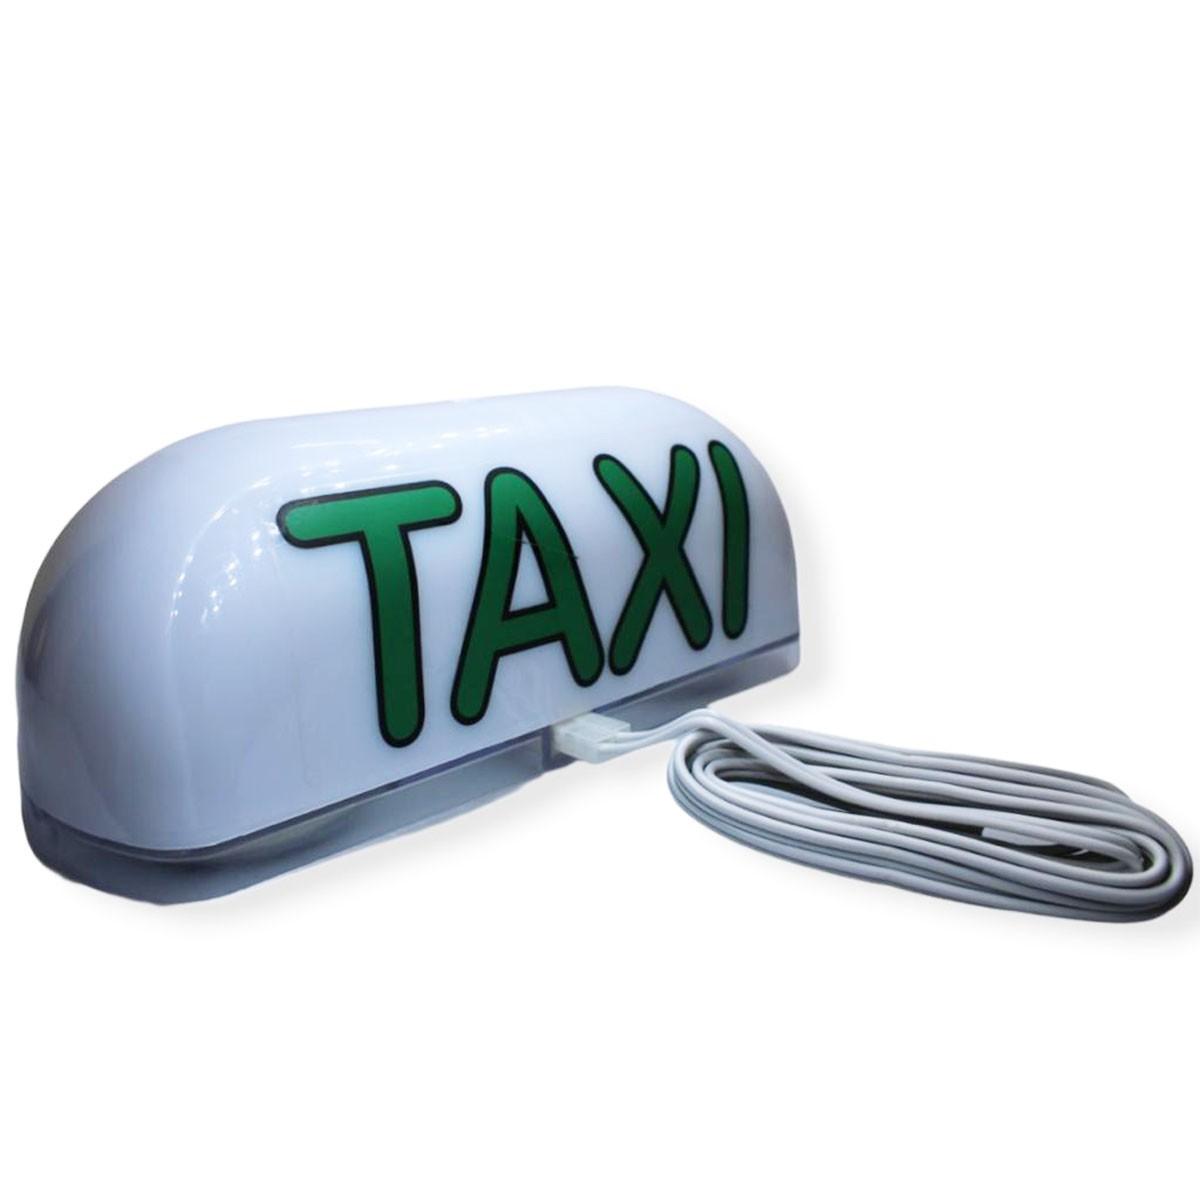 Luminoso Grande Taxi 2 Imãs Led 12v 23 x 8 x 7,5cm FIP